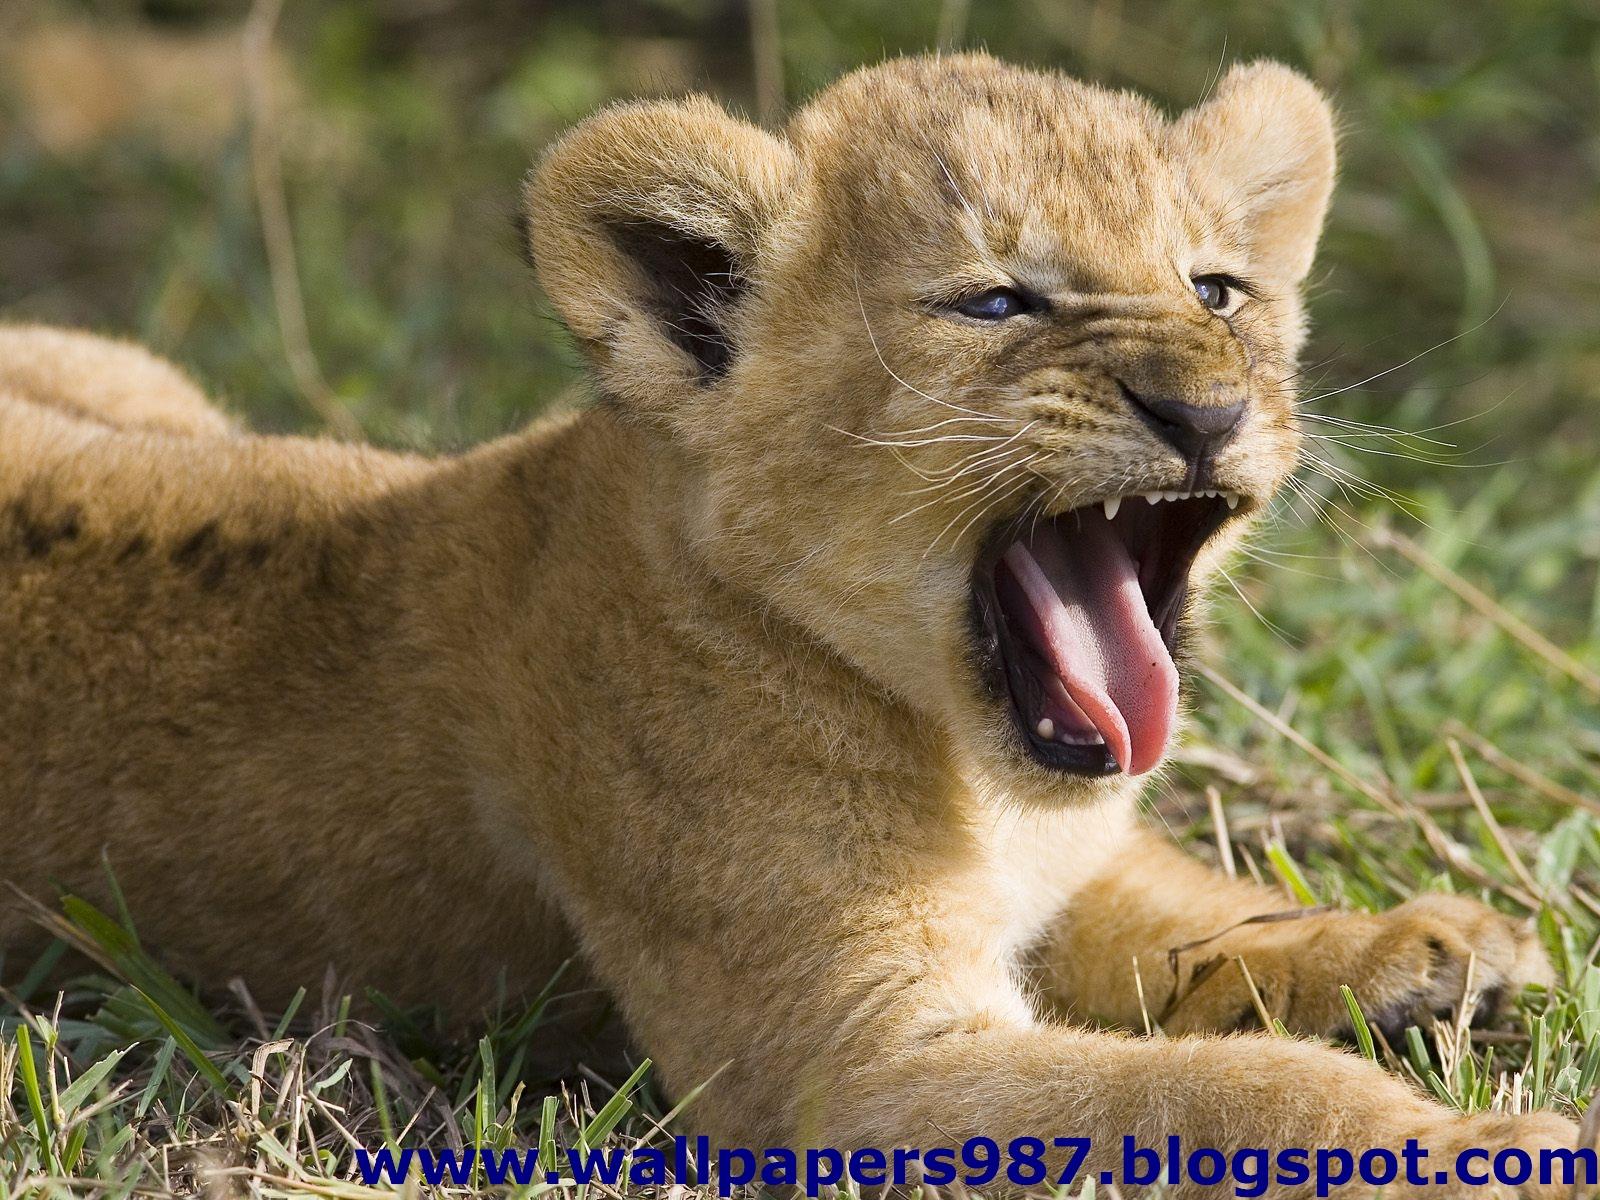 http://2.bp.blogspot.com/_SOSNZoTv8ng/TQYVr-yO2mI/AAAAAAAAAHE/um1IesAz4ws/s1600/windows_masaustu_arka_plan_resimleri_vahsi_kediler_aslan_kaplan_HD_HQ_Full_Animal.+Pic+%252870%2529.jpg